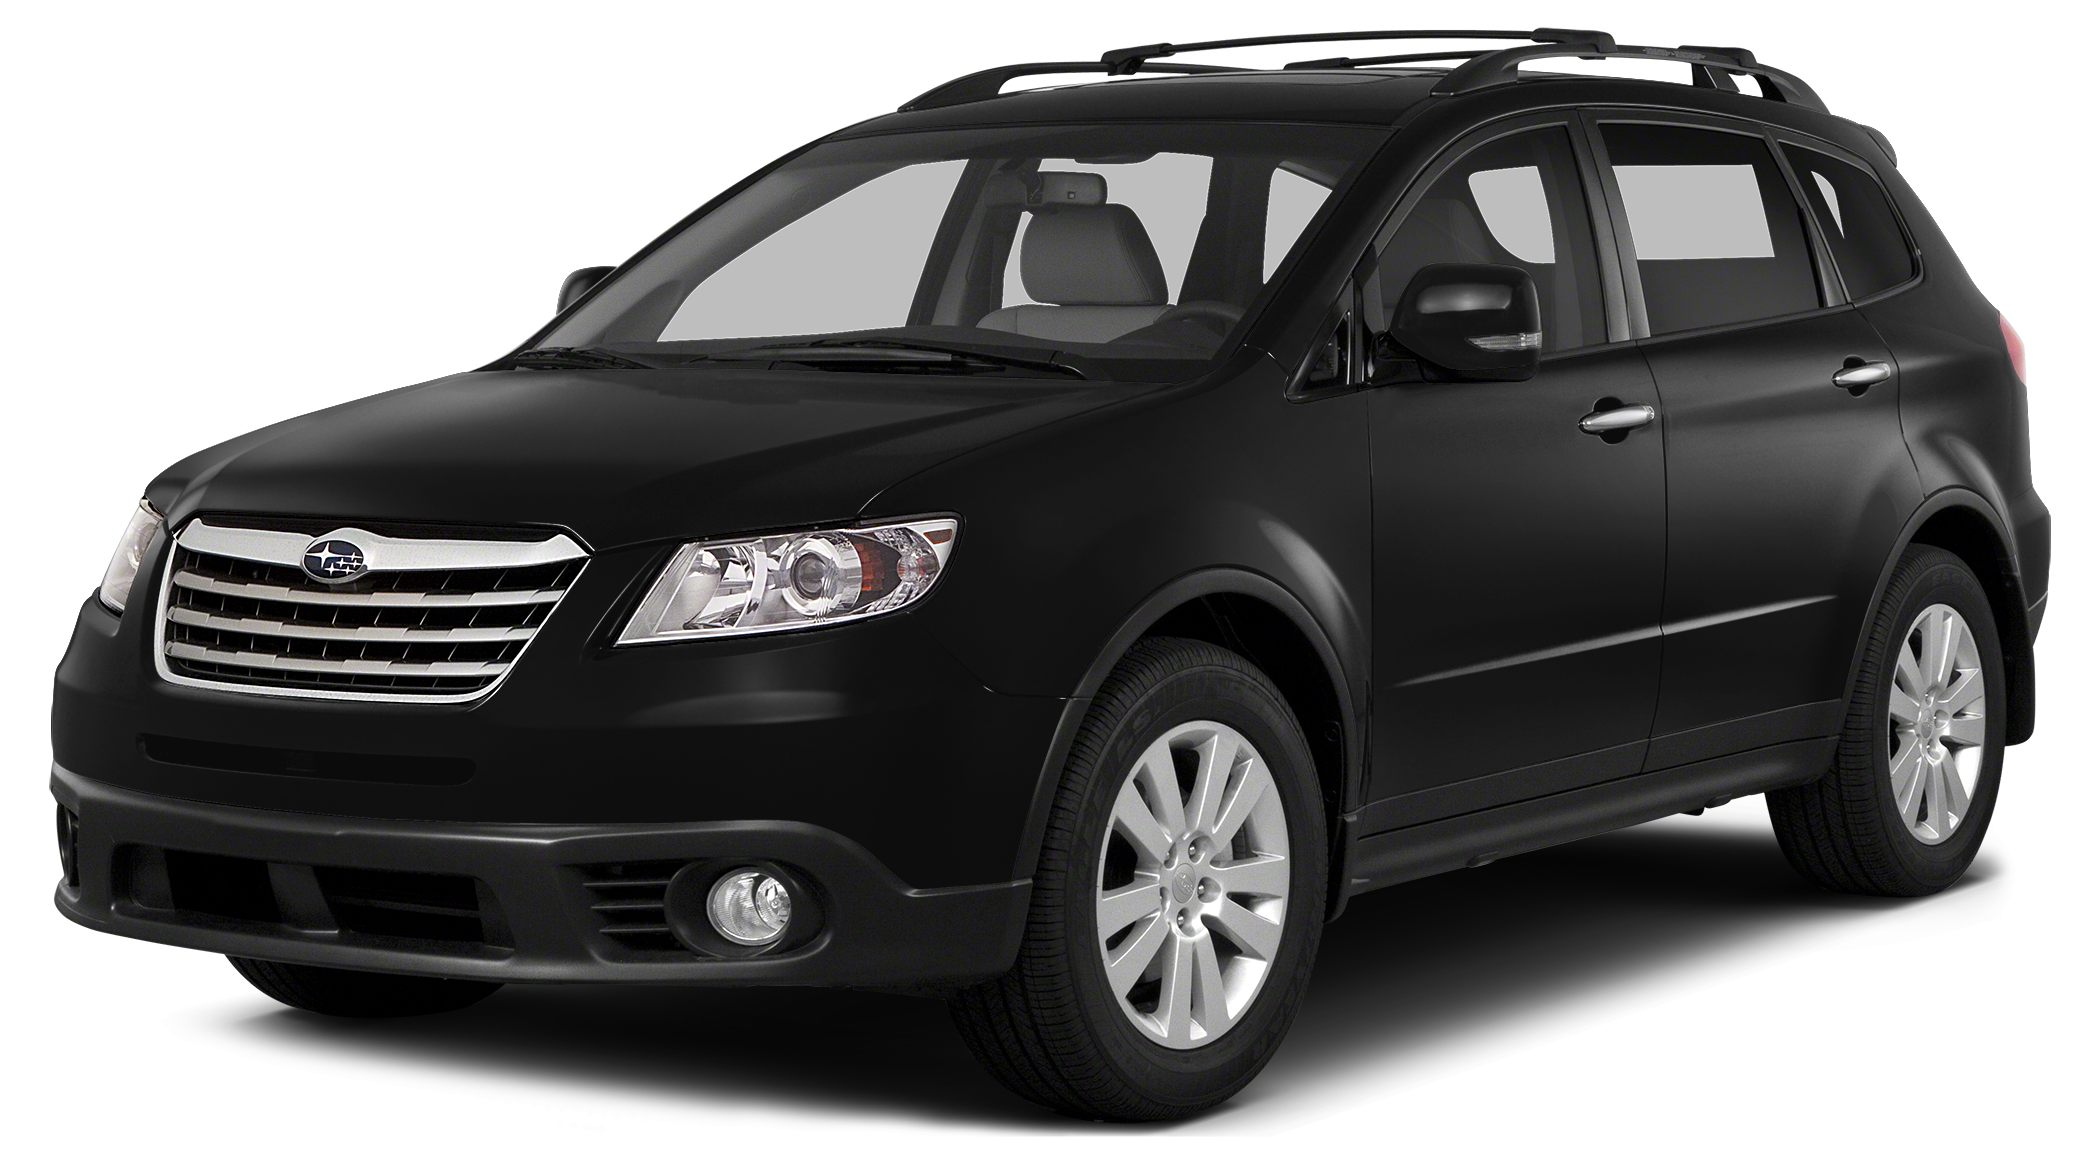 2014 Subaru Tribeca 36R Limited Miles 61325Color Crystal Black Silica Stock 20703 VIN 4S4WX